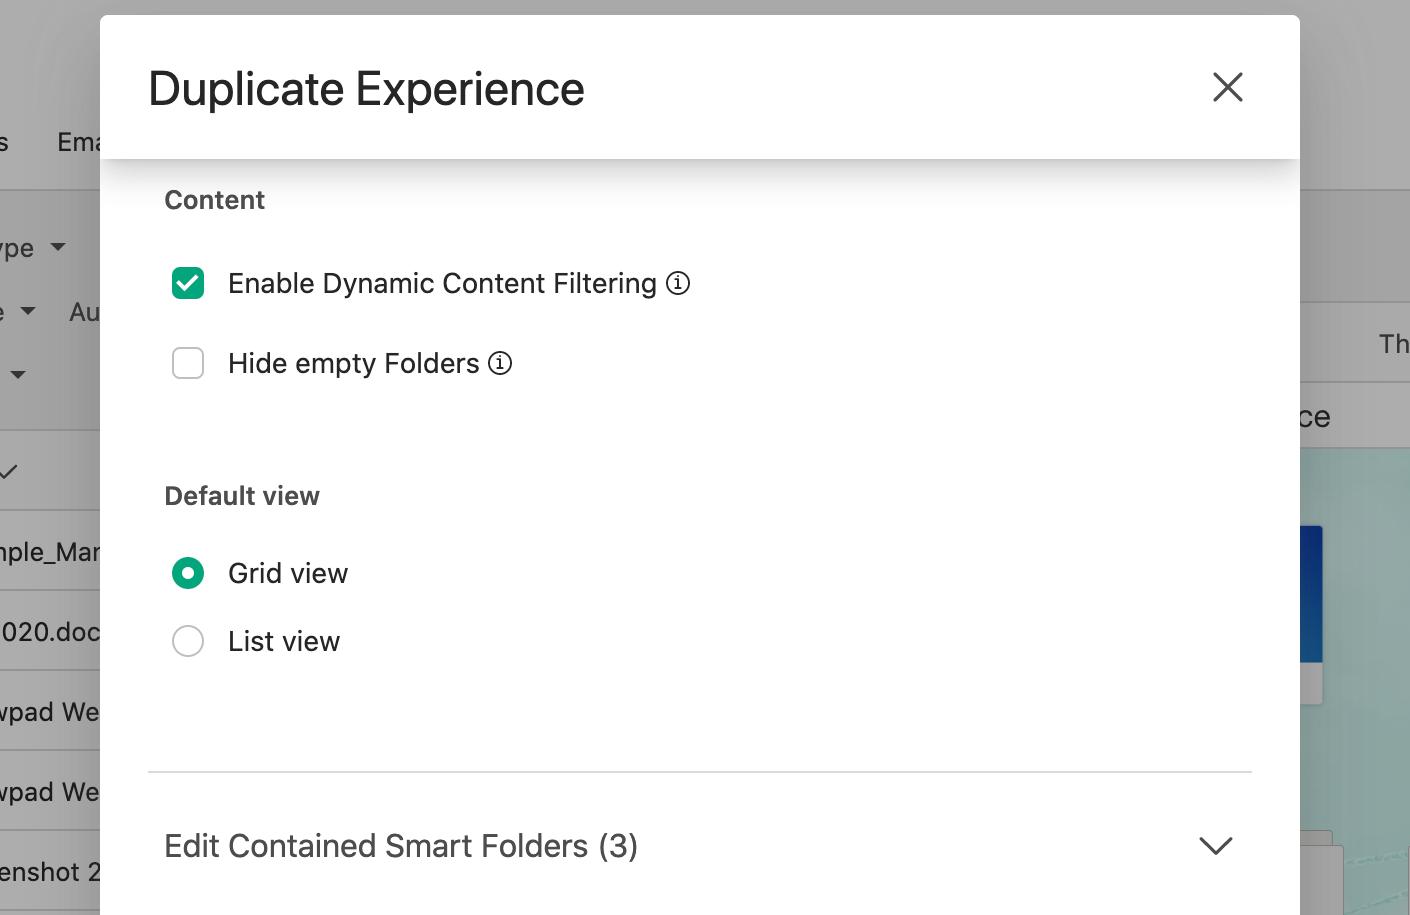 duplicate_experience_default_views.png